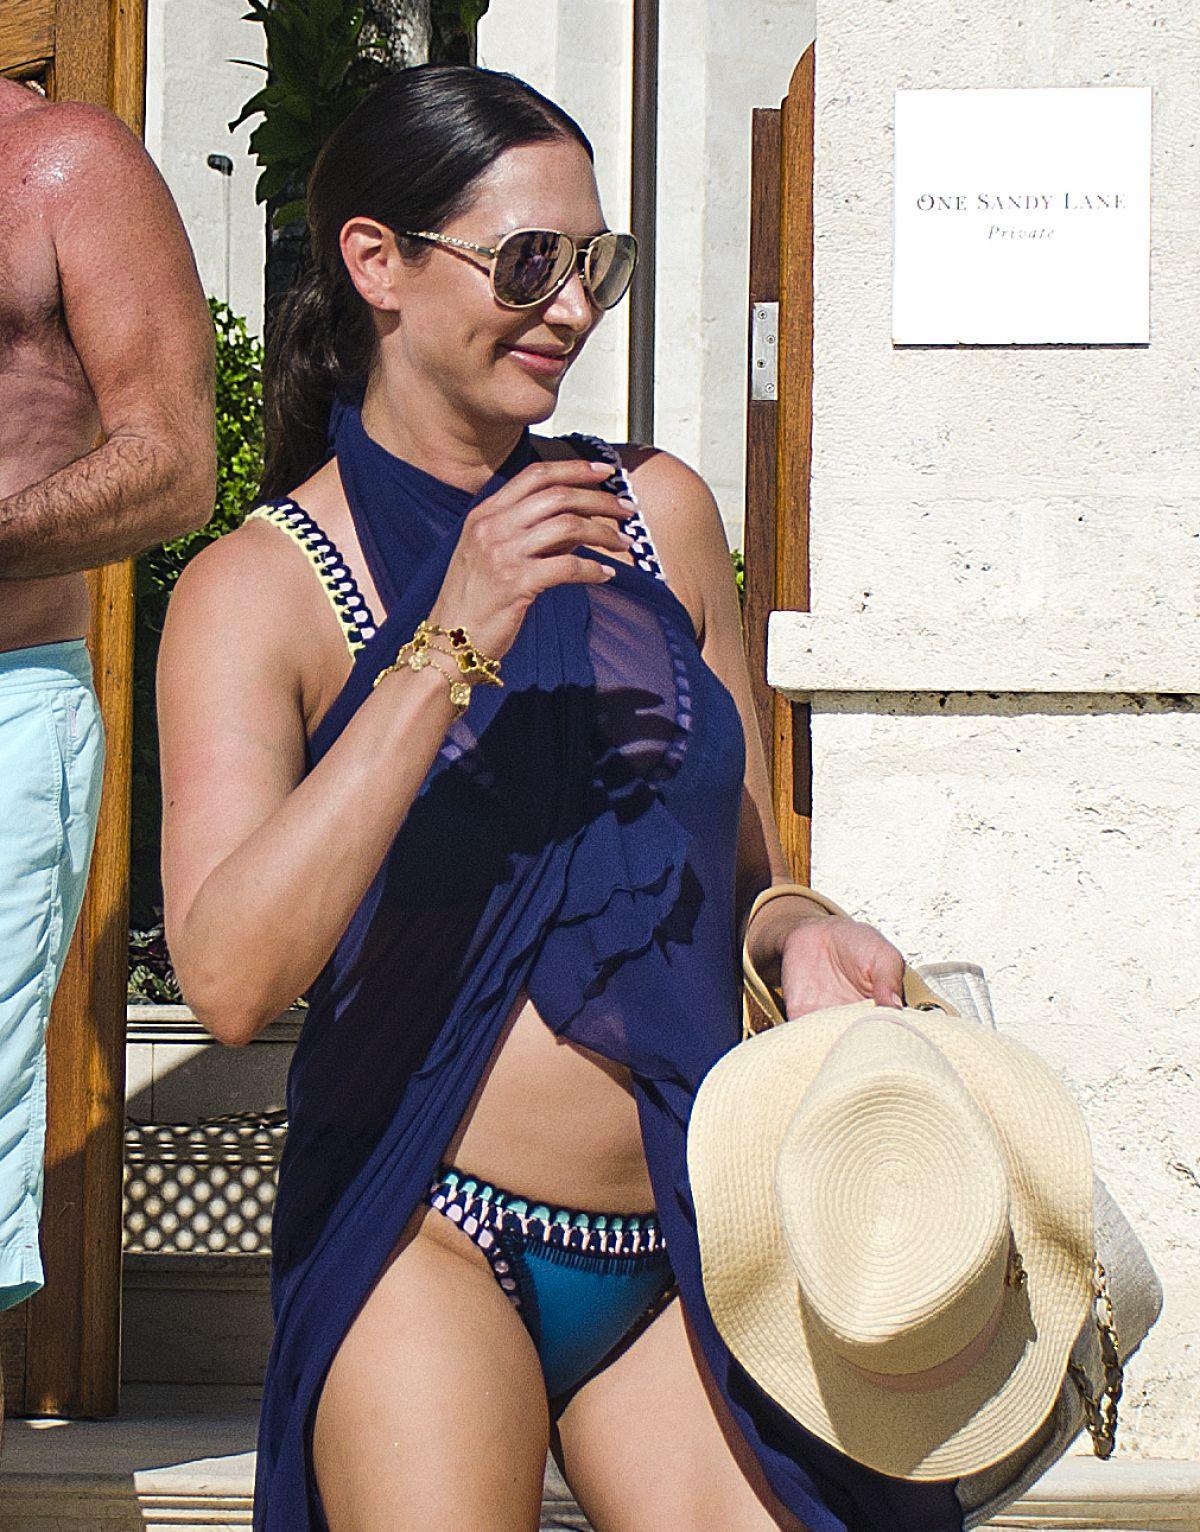 Sofia Jamora in Bikini on the beach in Maui Pic 5 of 35